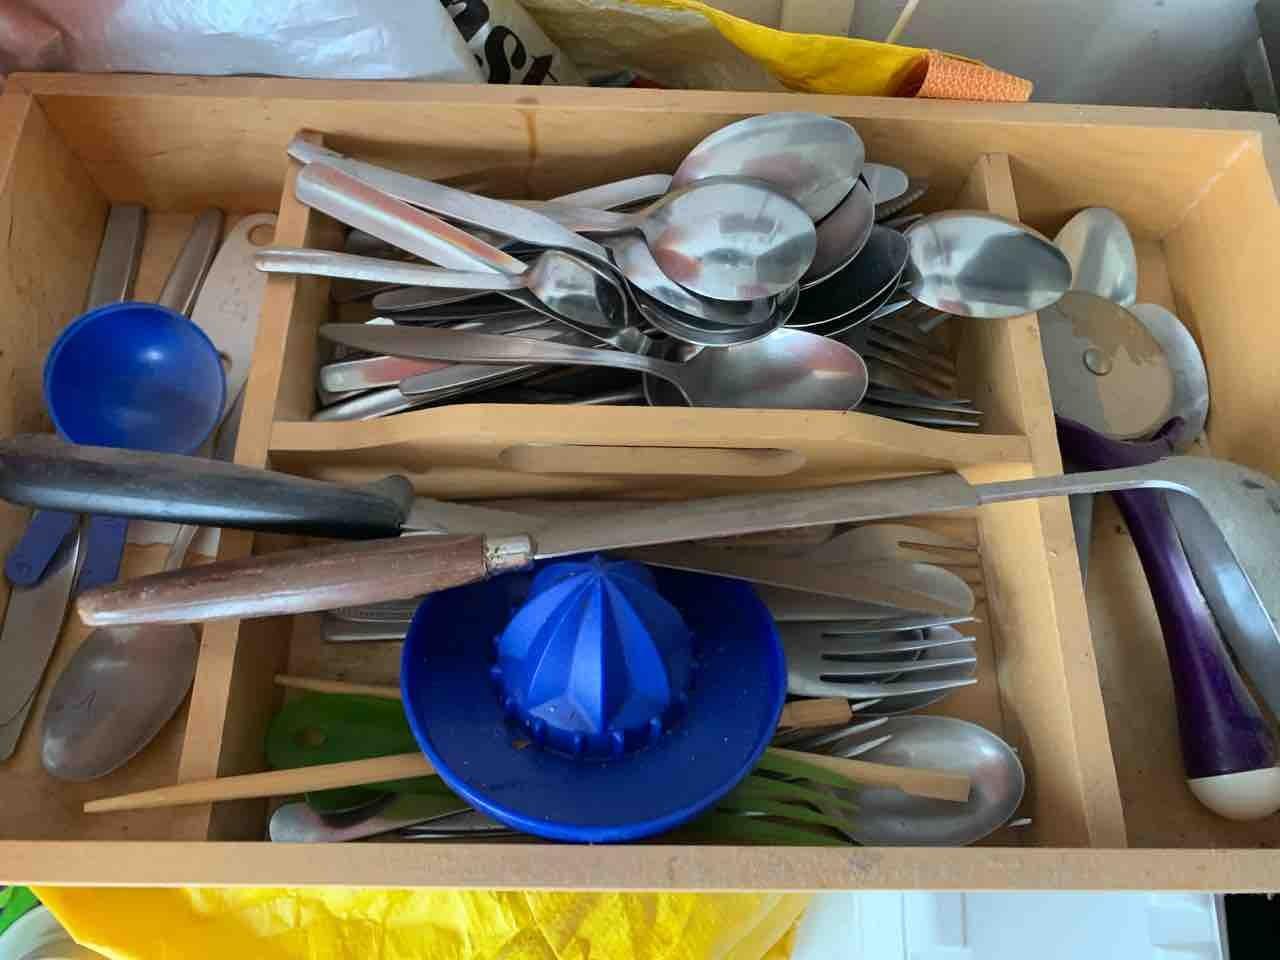 Box of cutlery/utensils